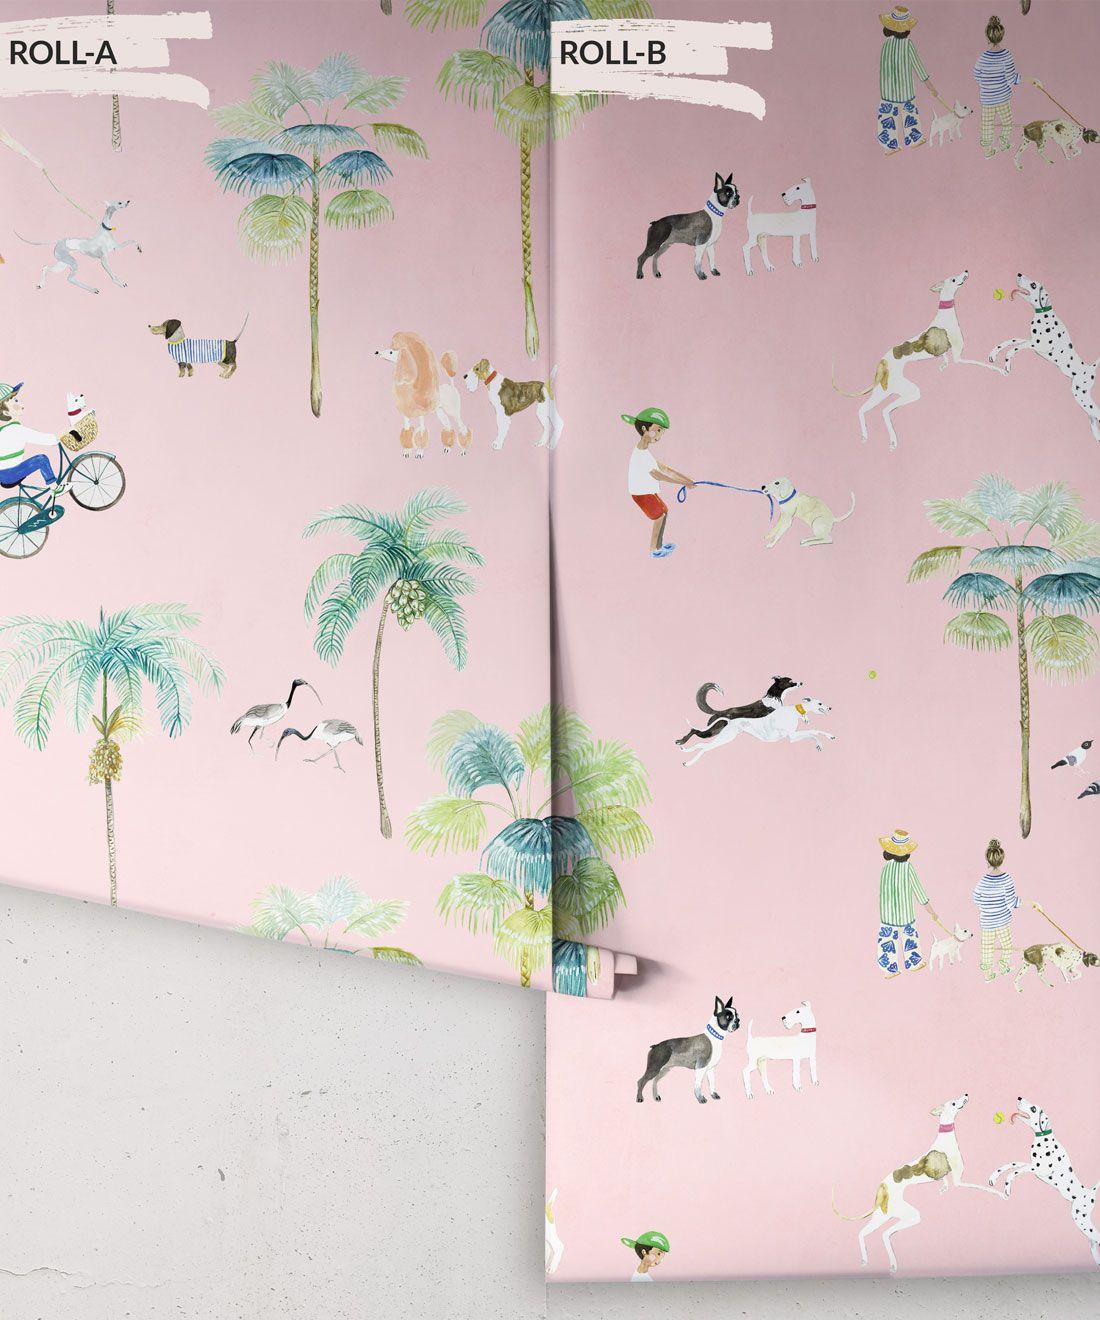 At The Dog Park Wallpaper •Kids Wallpaper • Pink • Rolls